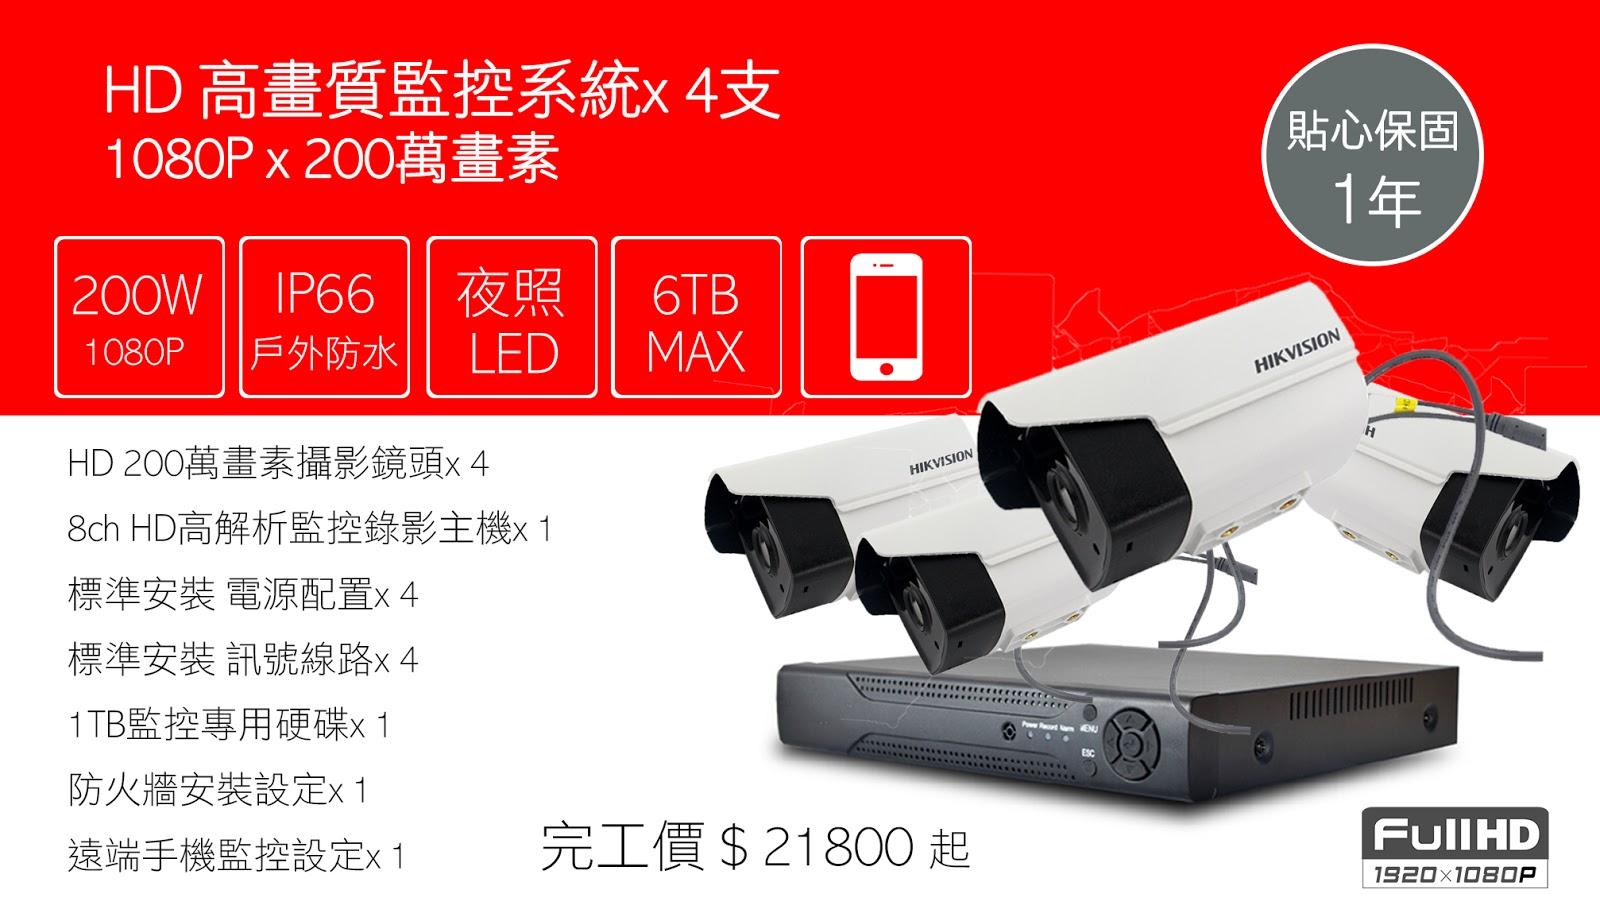 REC銳科安防監控x HD高畫質監視器 x 專業規畫‧安裝‧維修 0800-255-001 : 《 HD 1080P x 200萬畫素 x 優惠專案